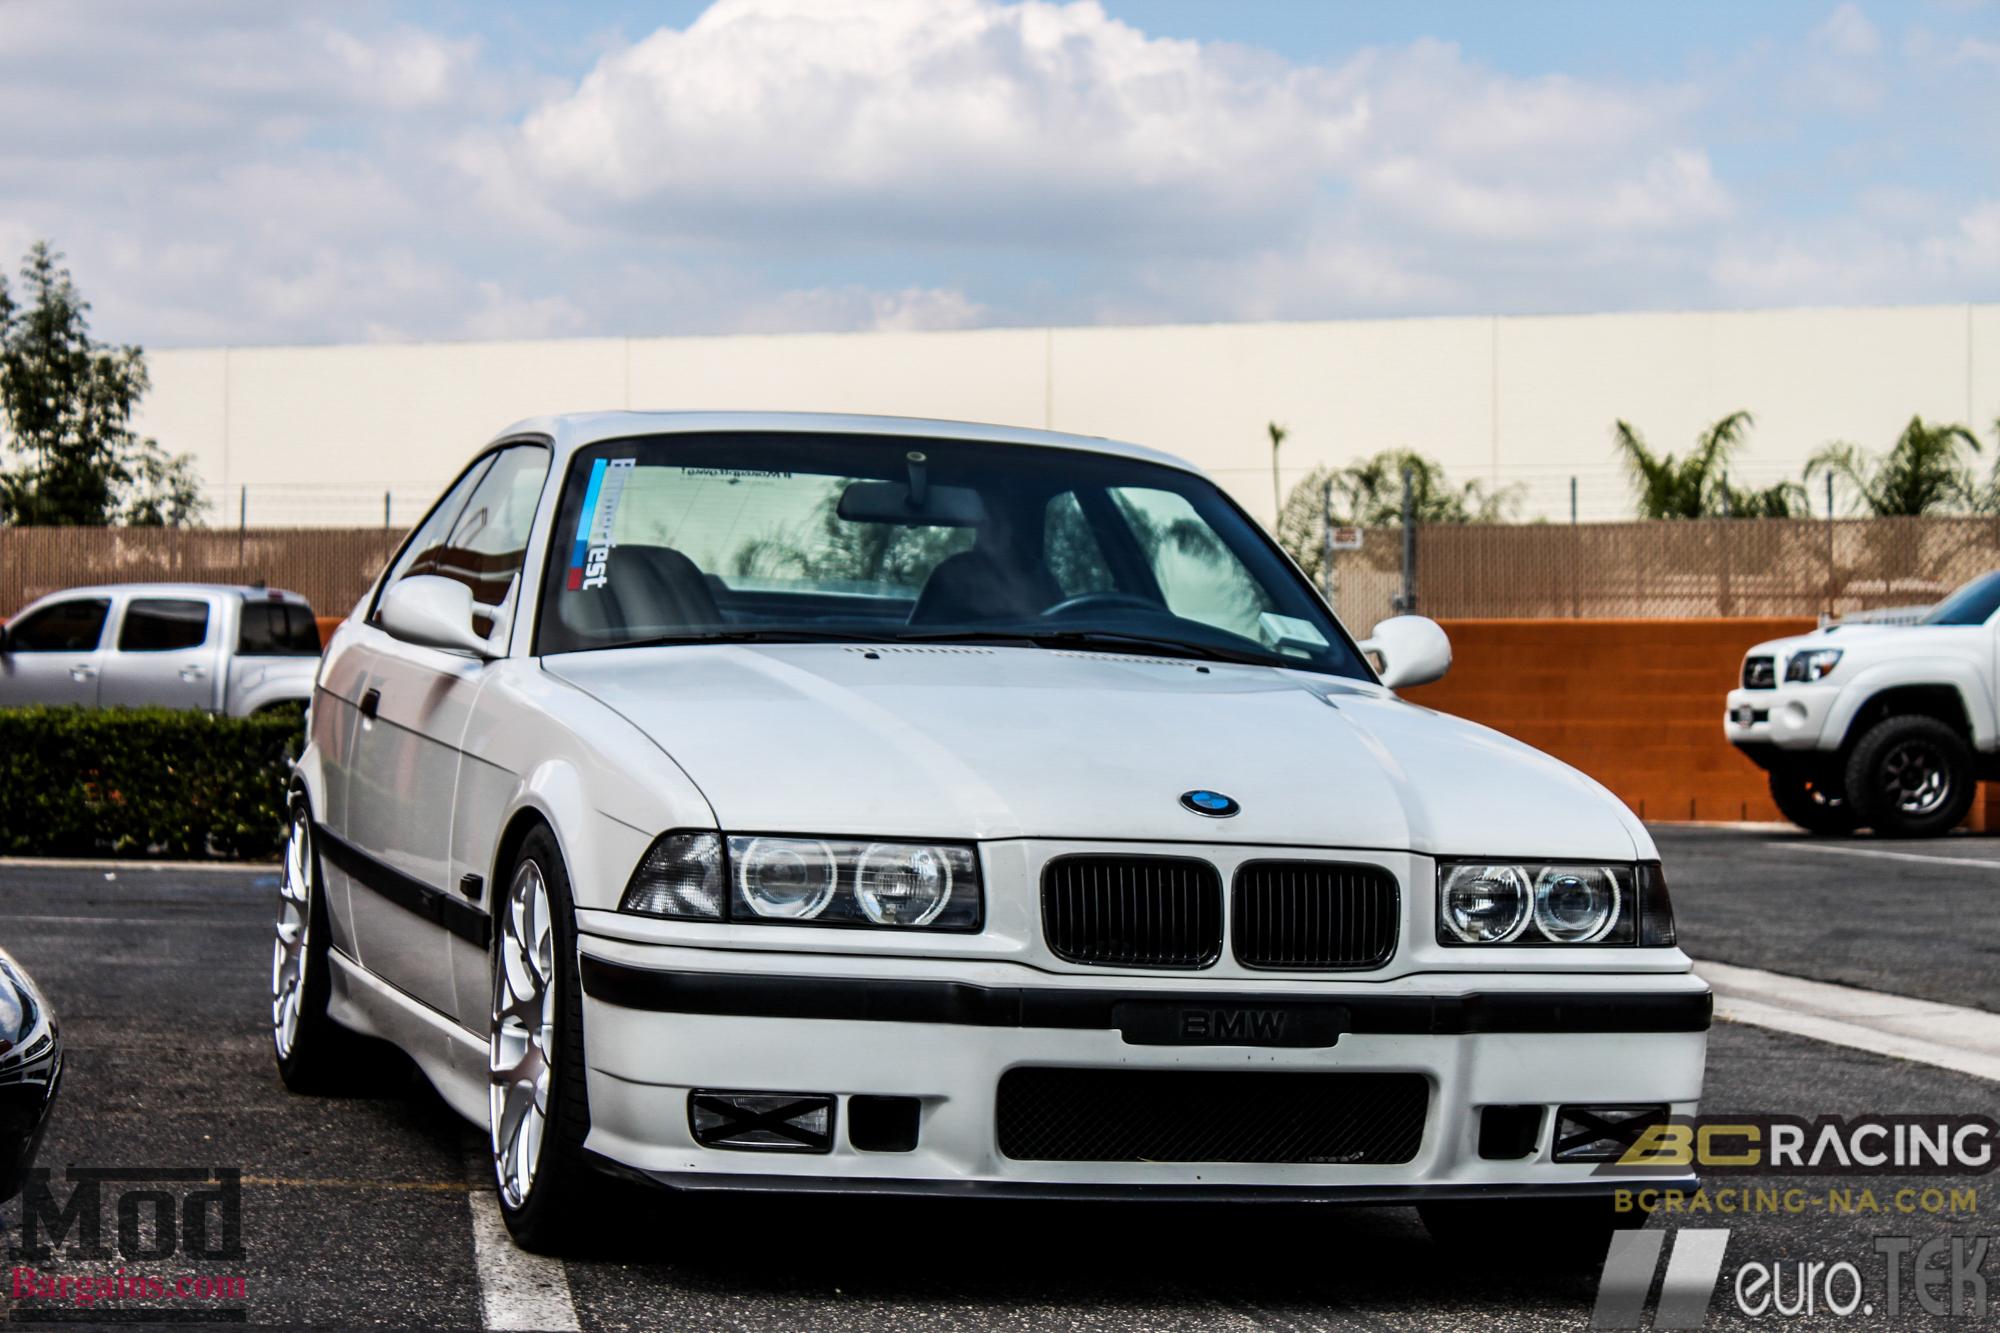 Oem Bmw Wheels >> E36 BMW M3 on BC Coilovers + Eurotek Wheels